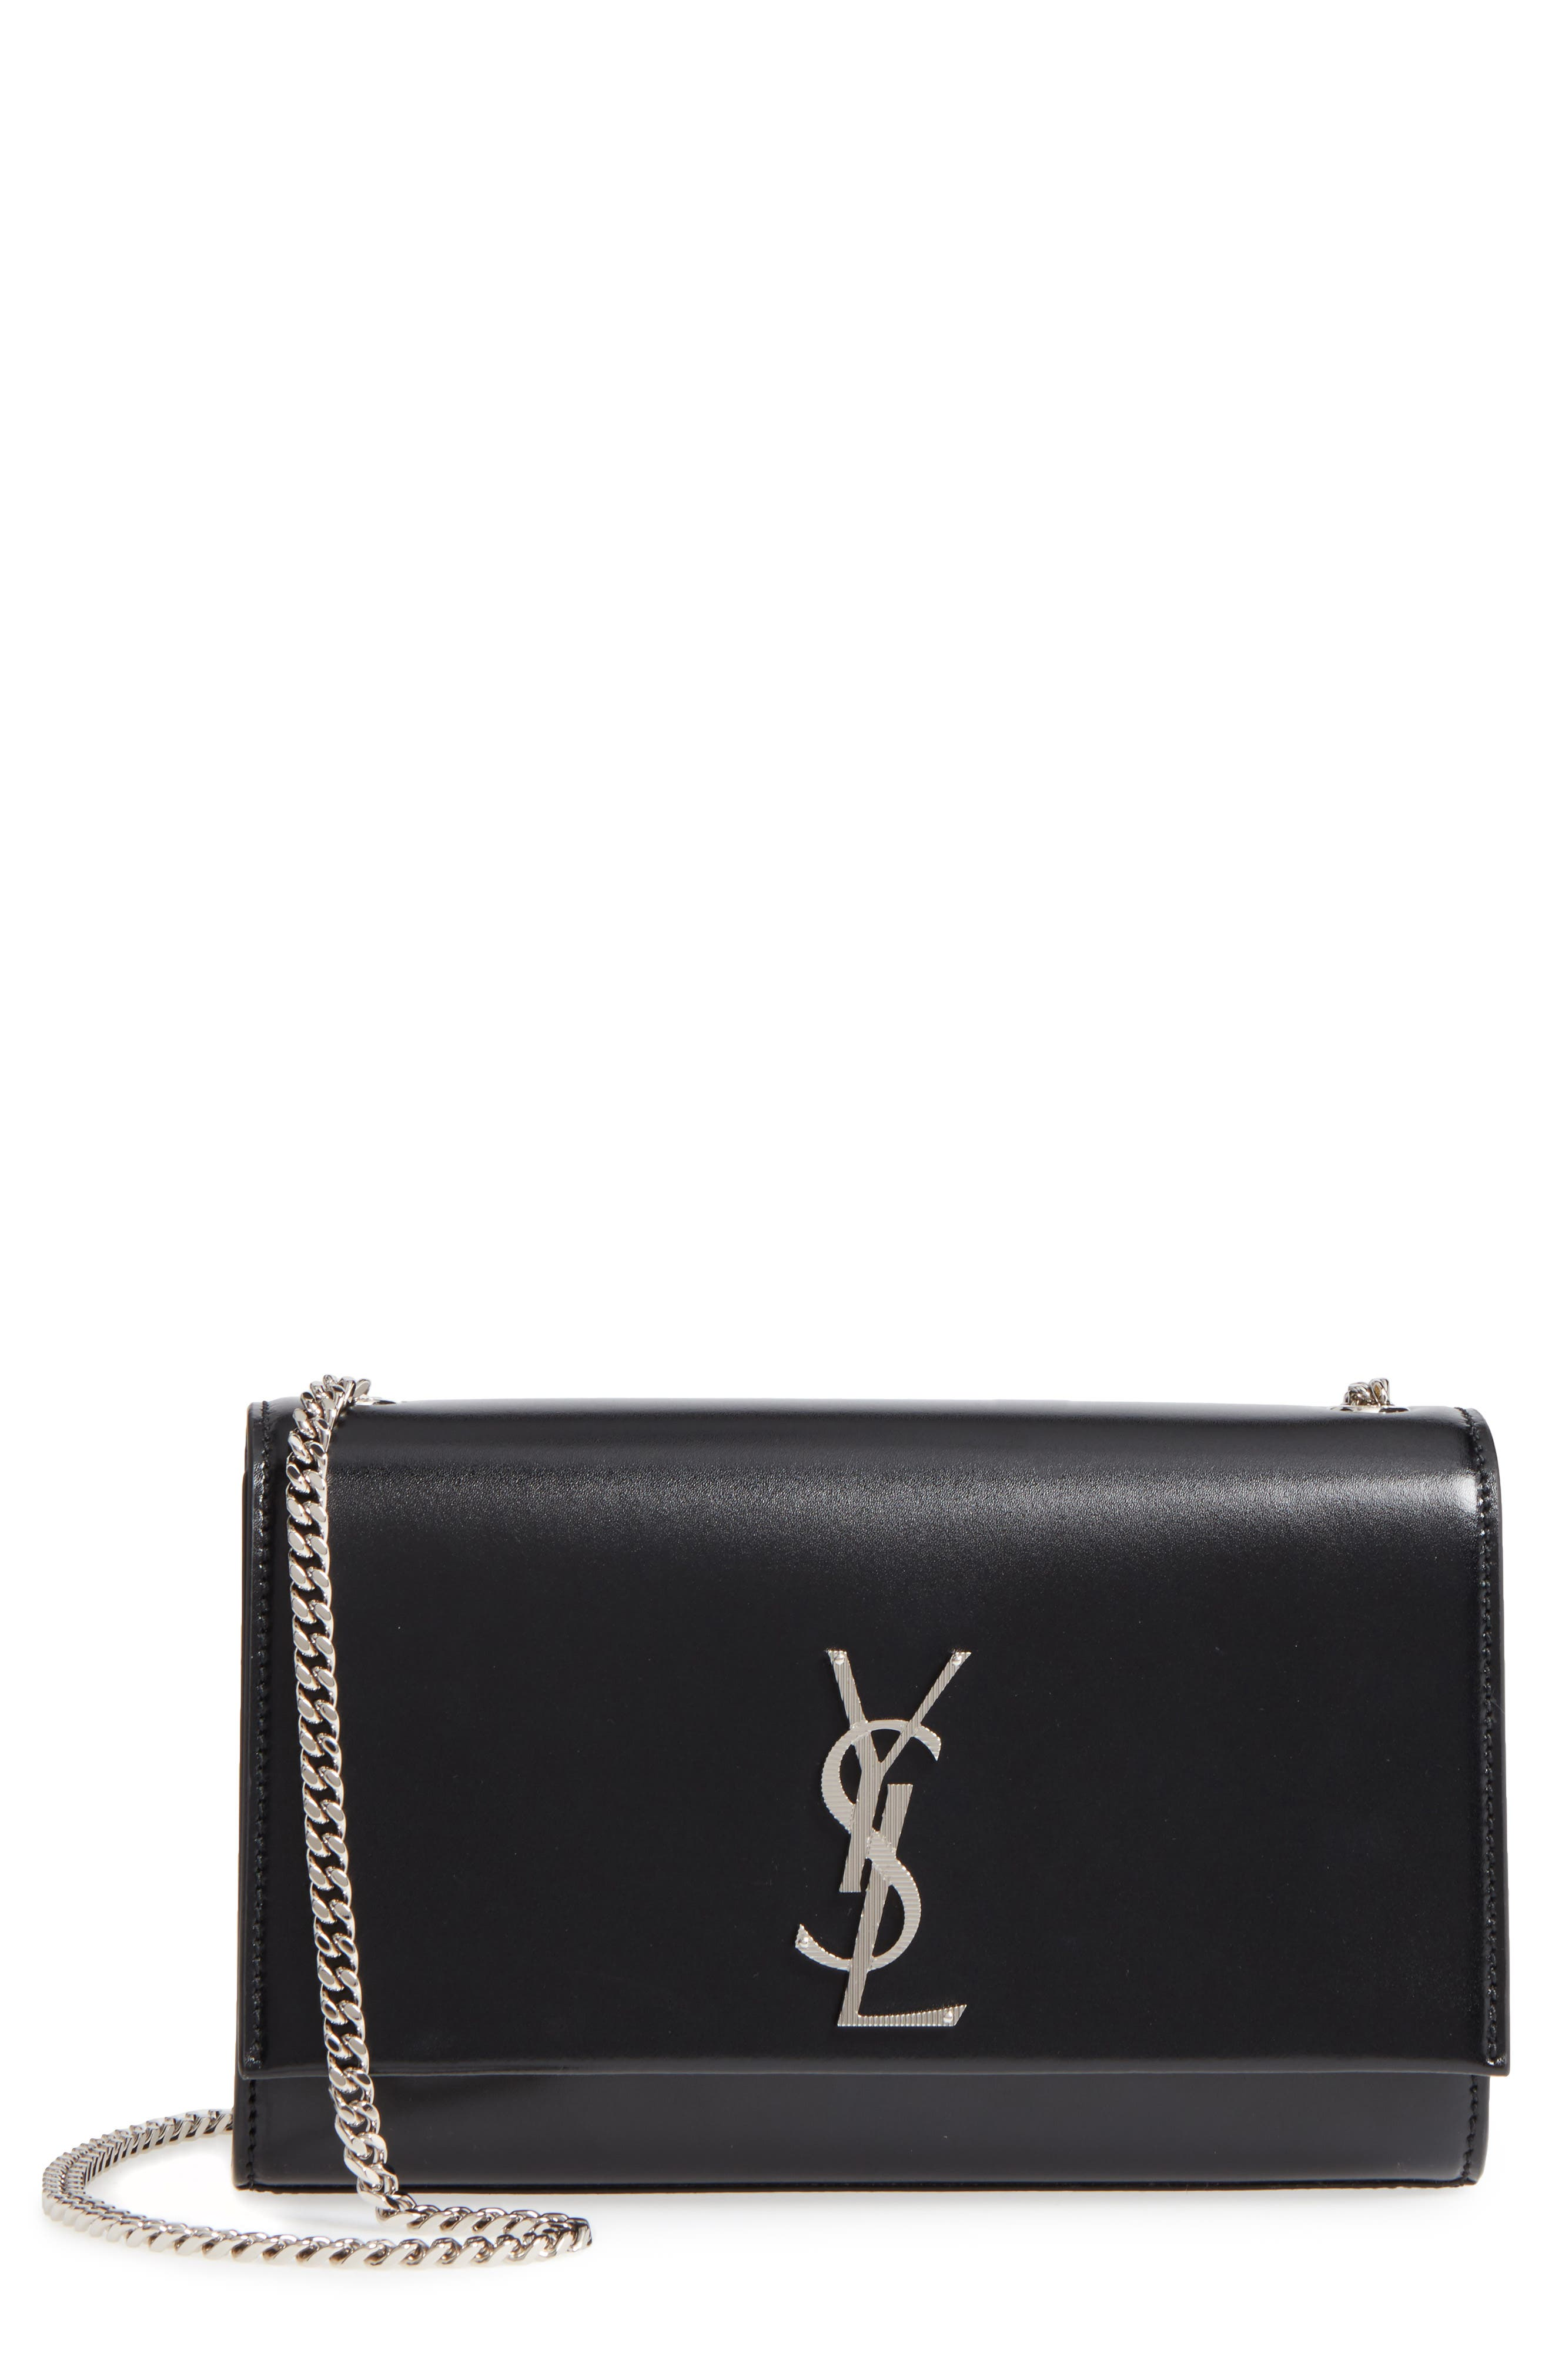 Medium Kate Calfskin Leather Crossbody Bag,                         Main,                         color, 001